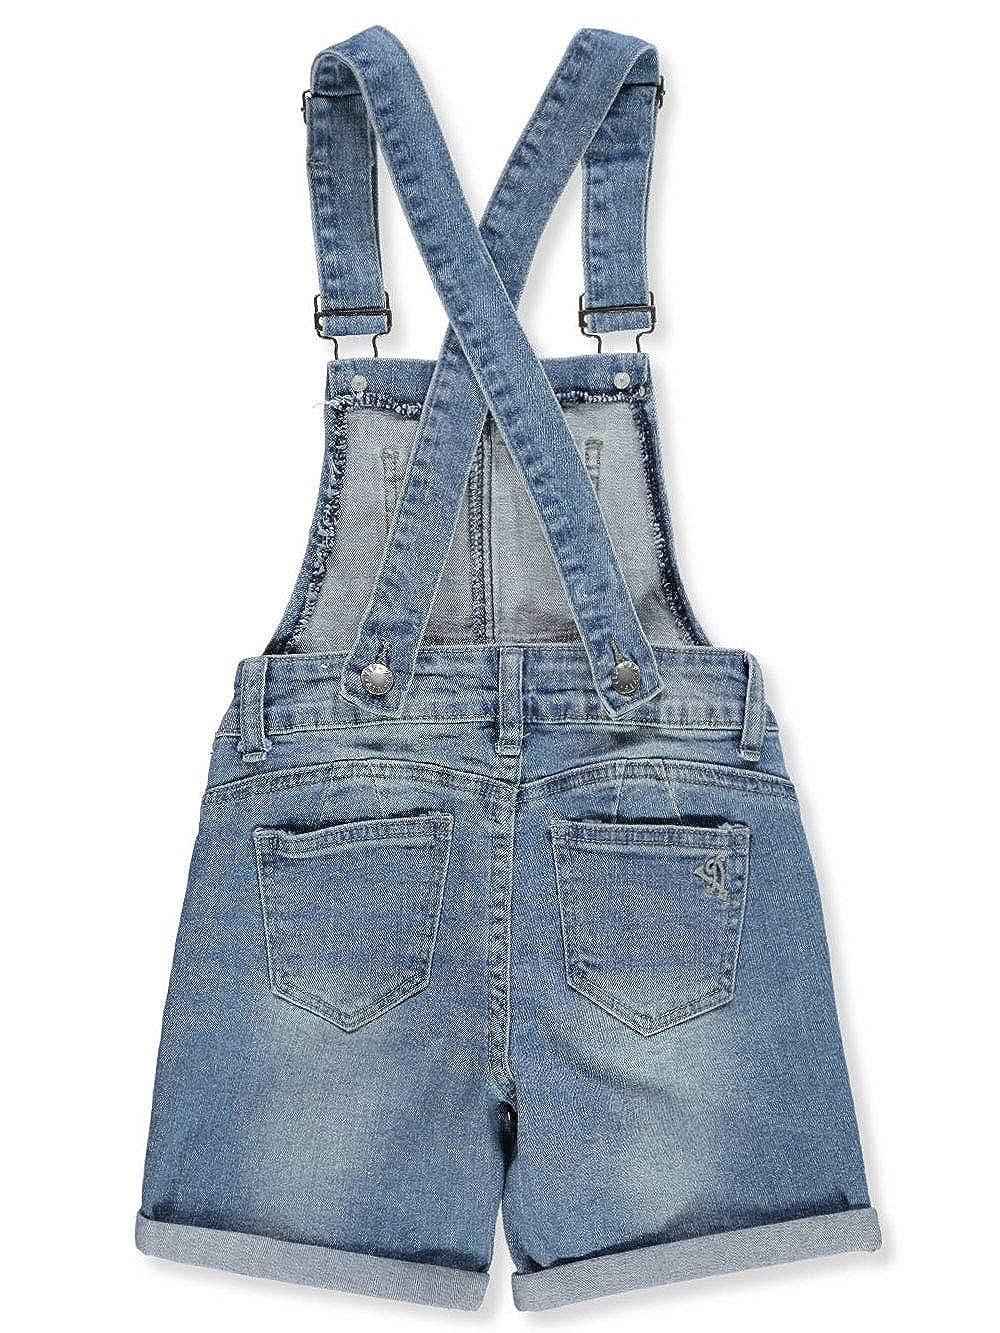 Colors as Shown 3t VIP Jeans Toddler Denim Shortalls